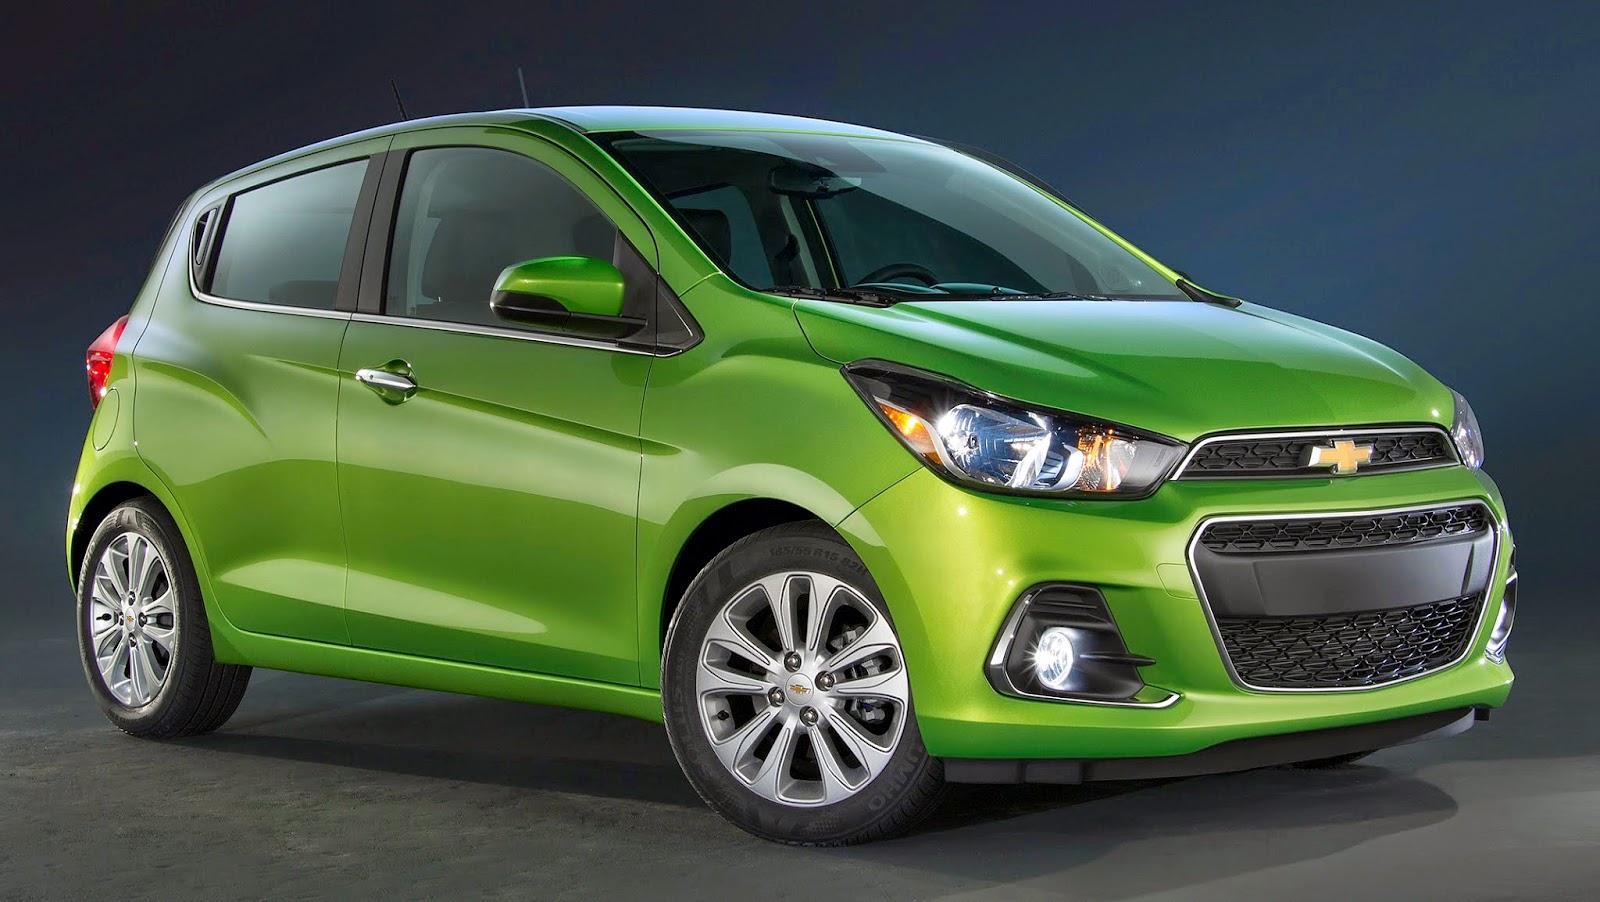 Chevrolet apresenta o compacto Spark 2016 146b8ccde5f03